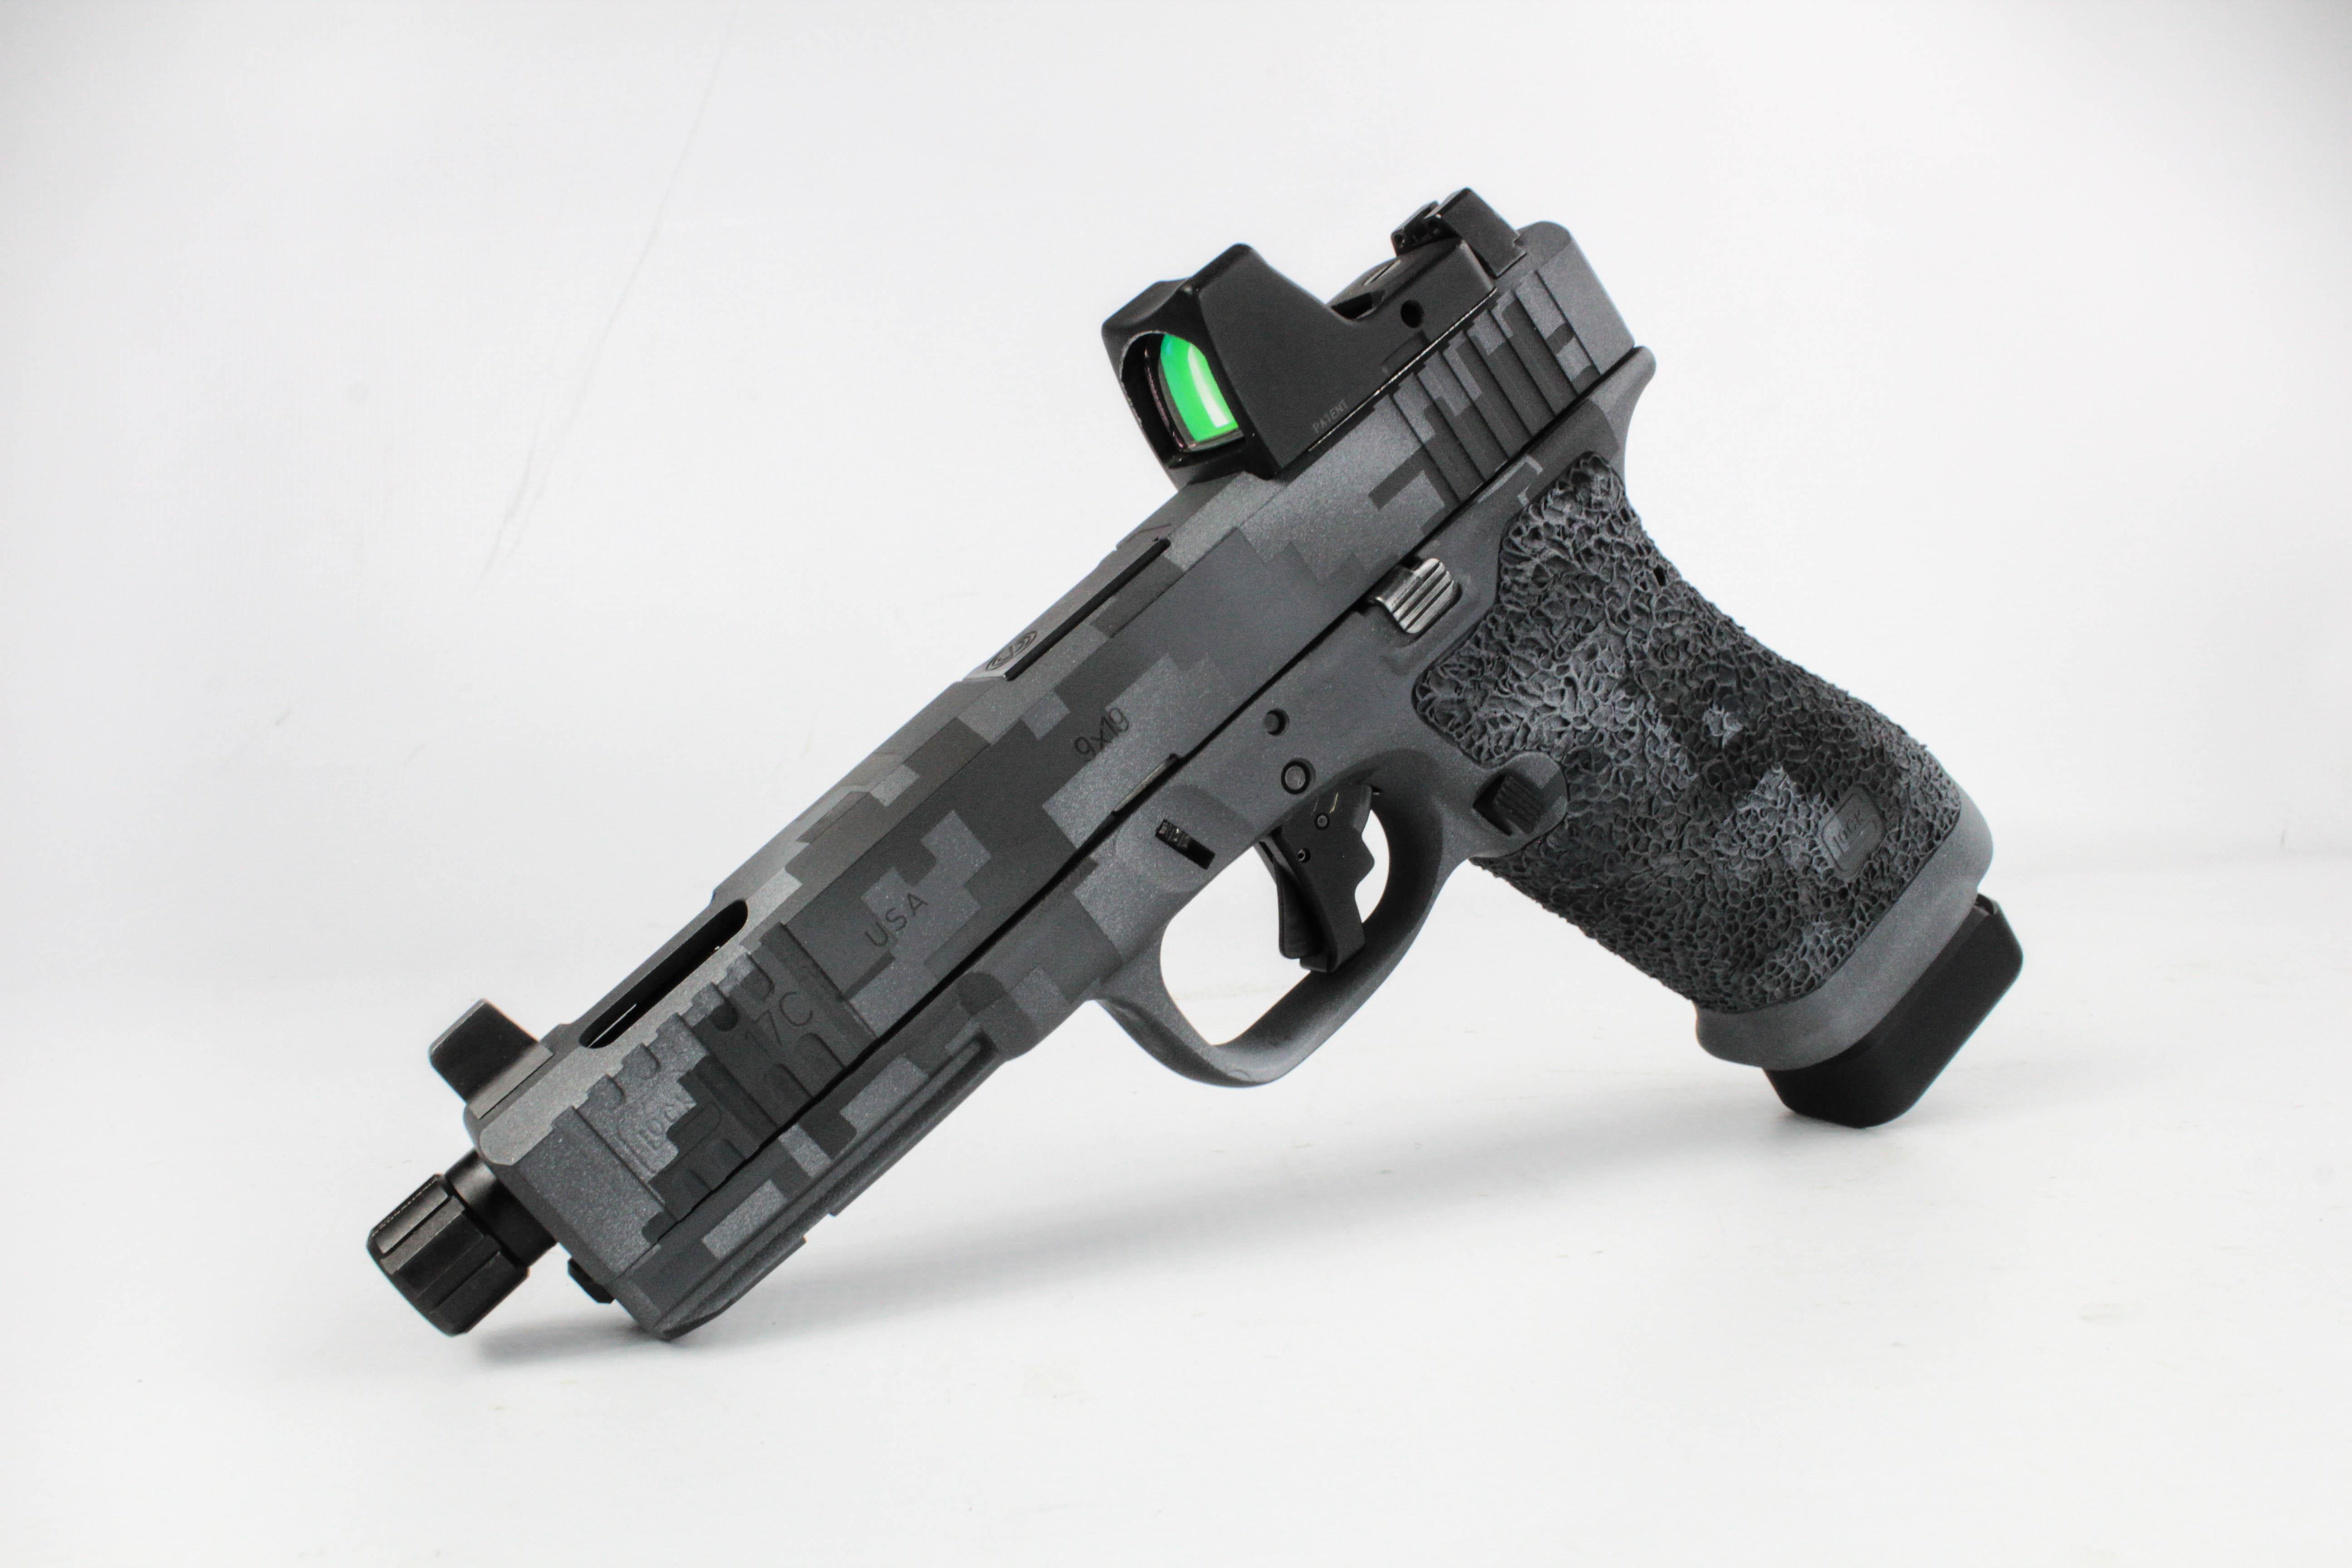 Digital Camouflage Cerakote Pistol